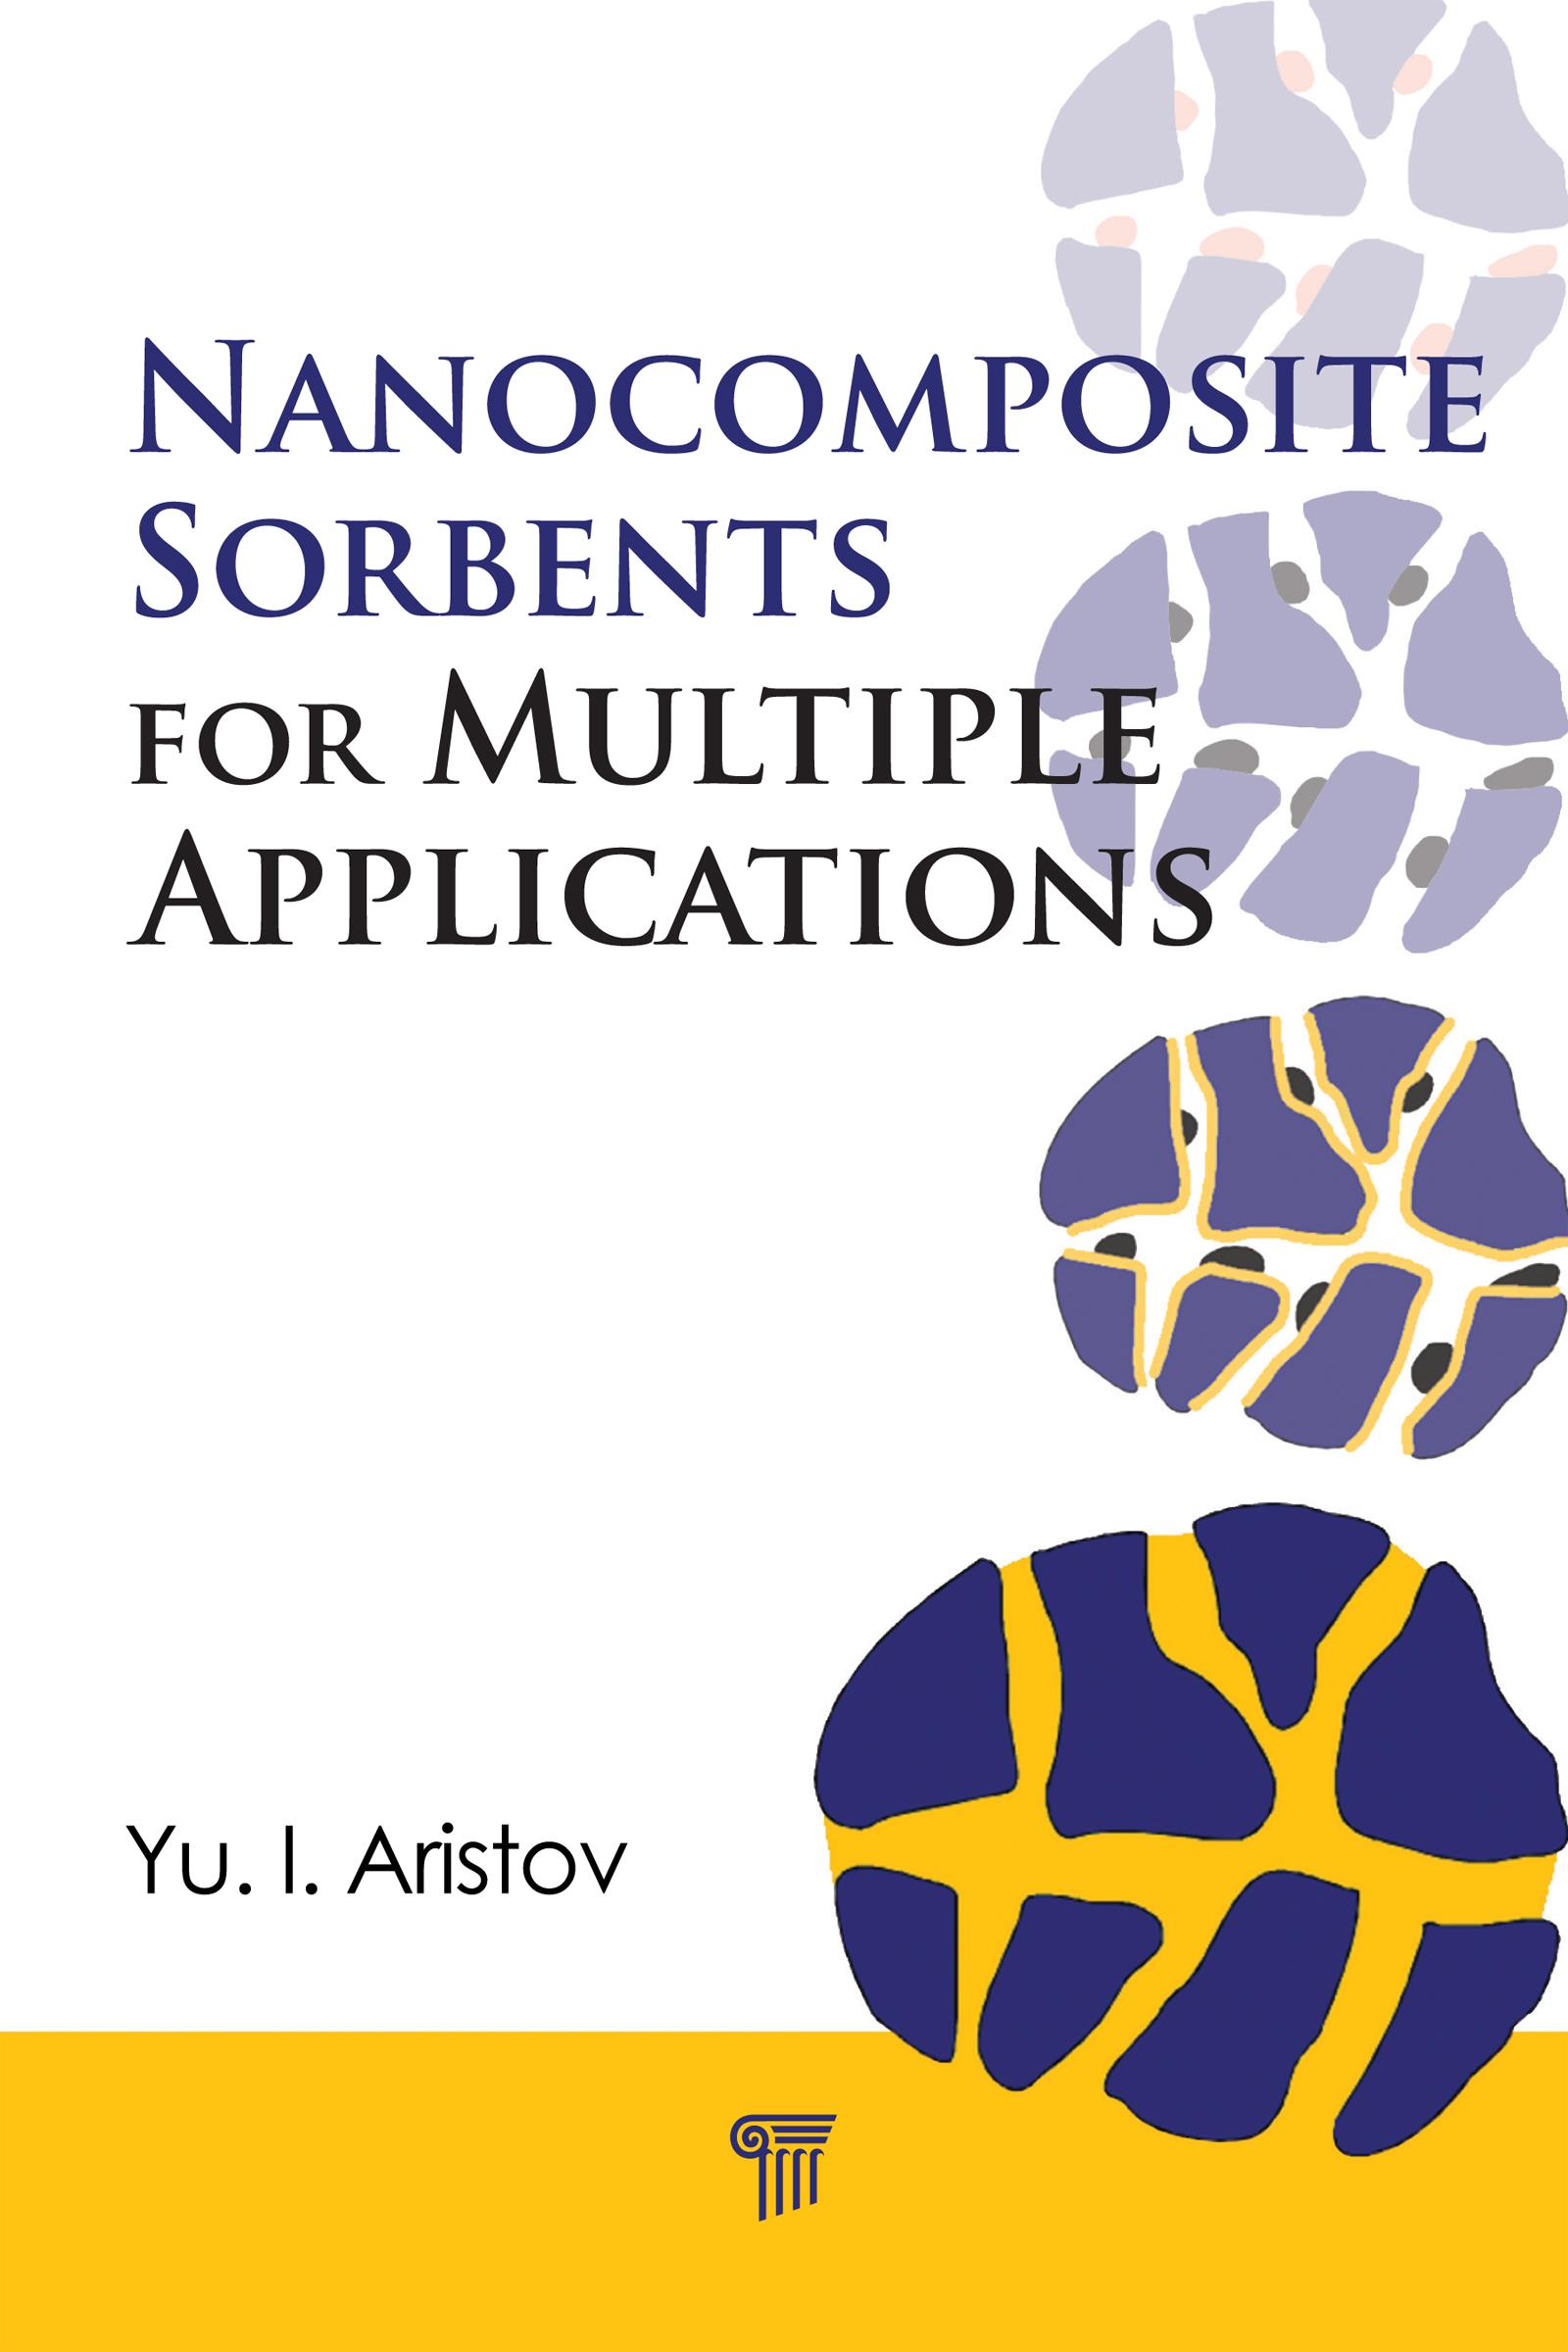 Composite Sorbents of Carbon Dioxide